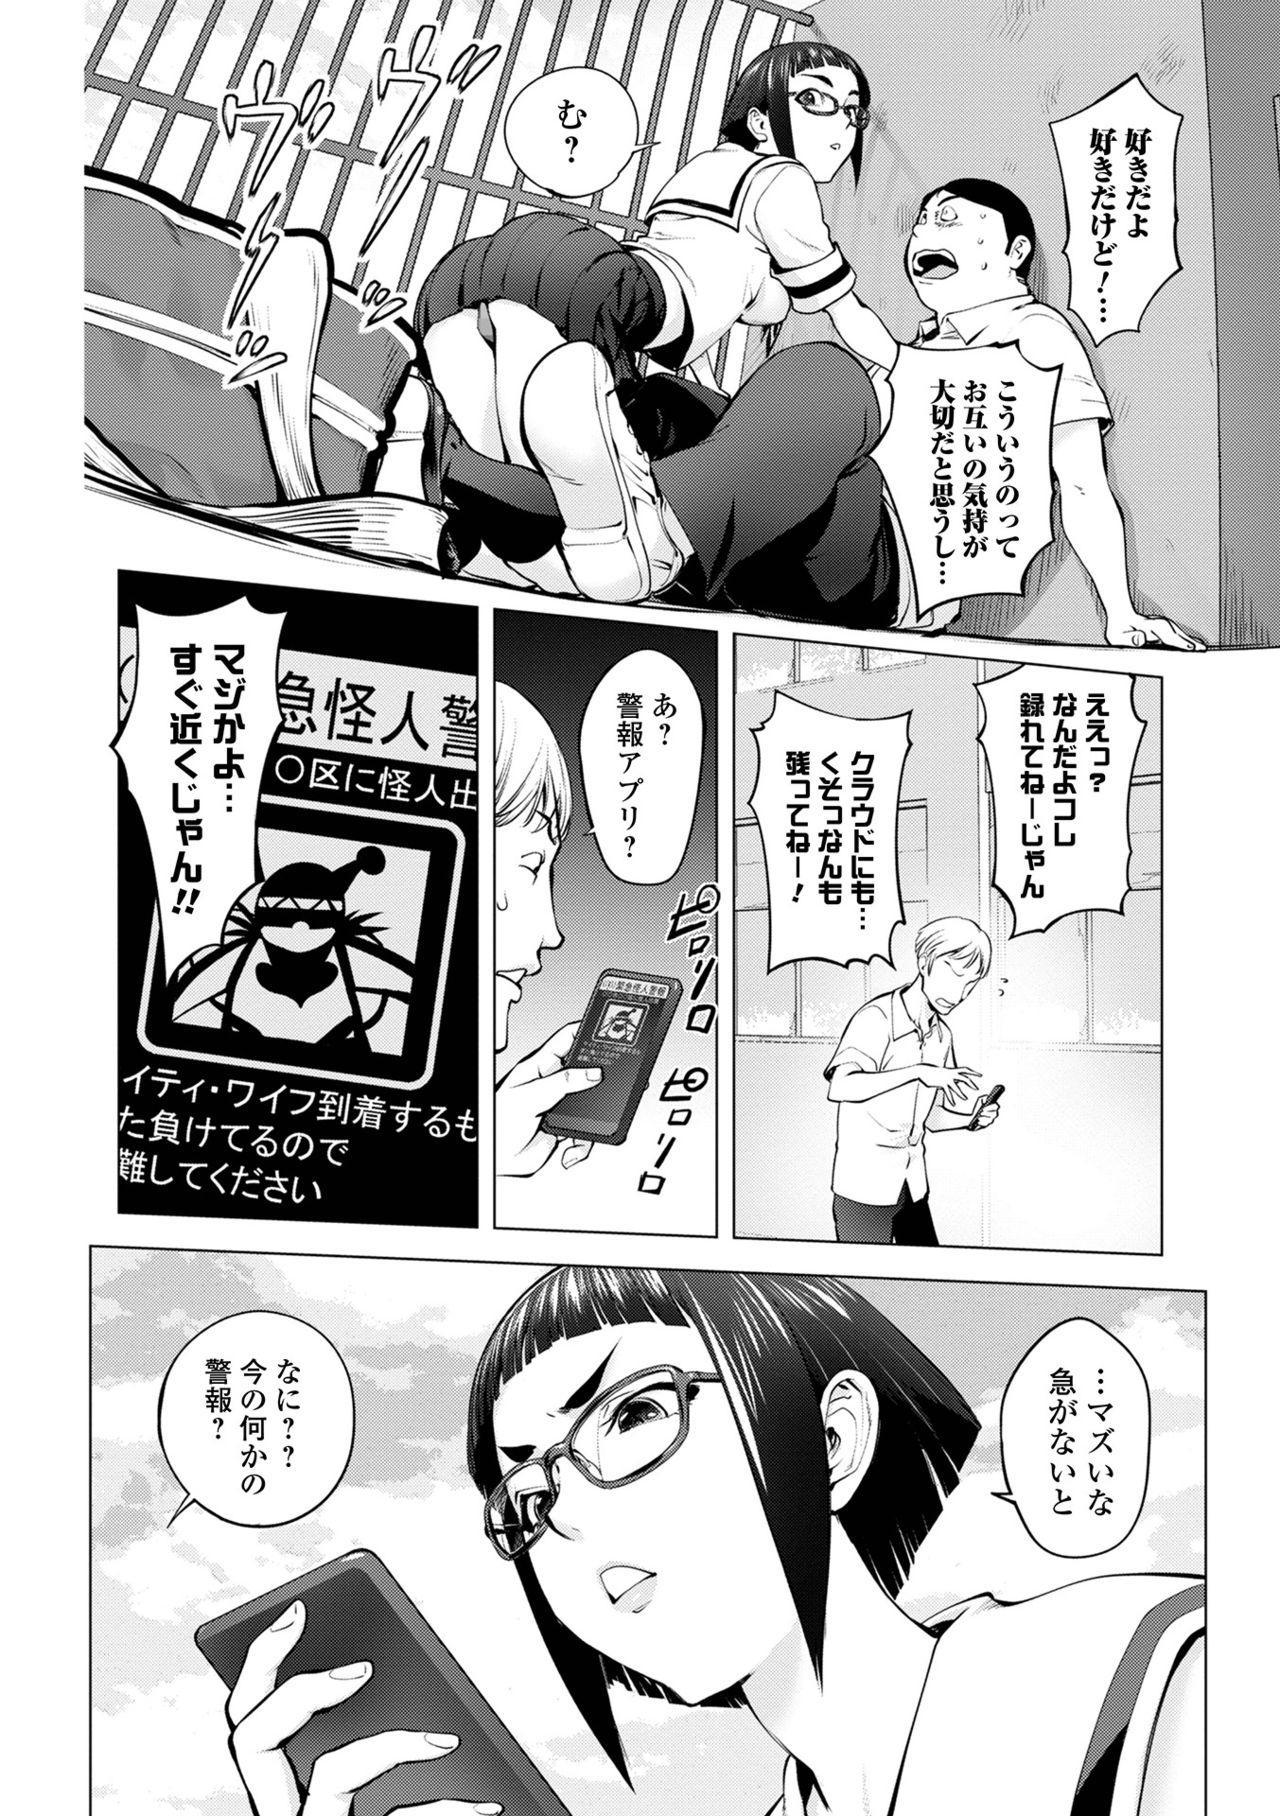 COMIC Shigekiteki SQUIRT!! Vol. 25 75